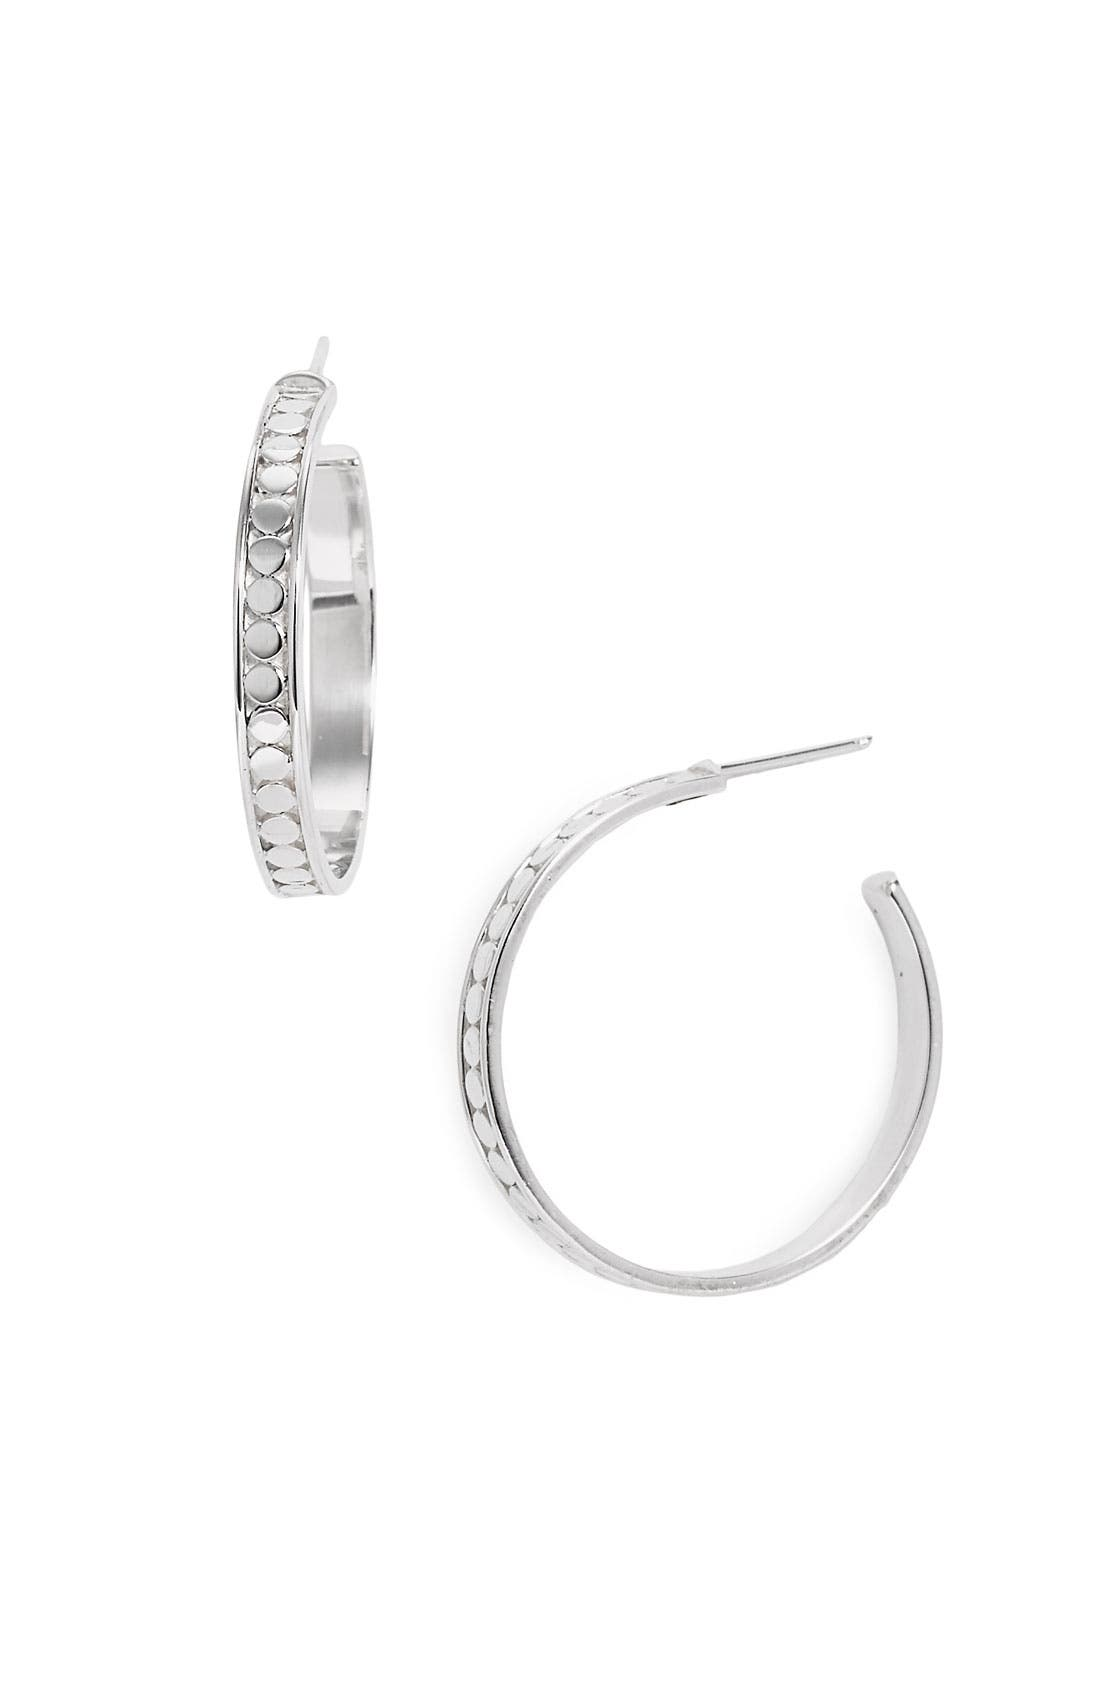 Main Image - Anna Beck 'Bali' Hoop Earrings